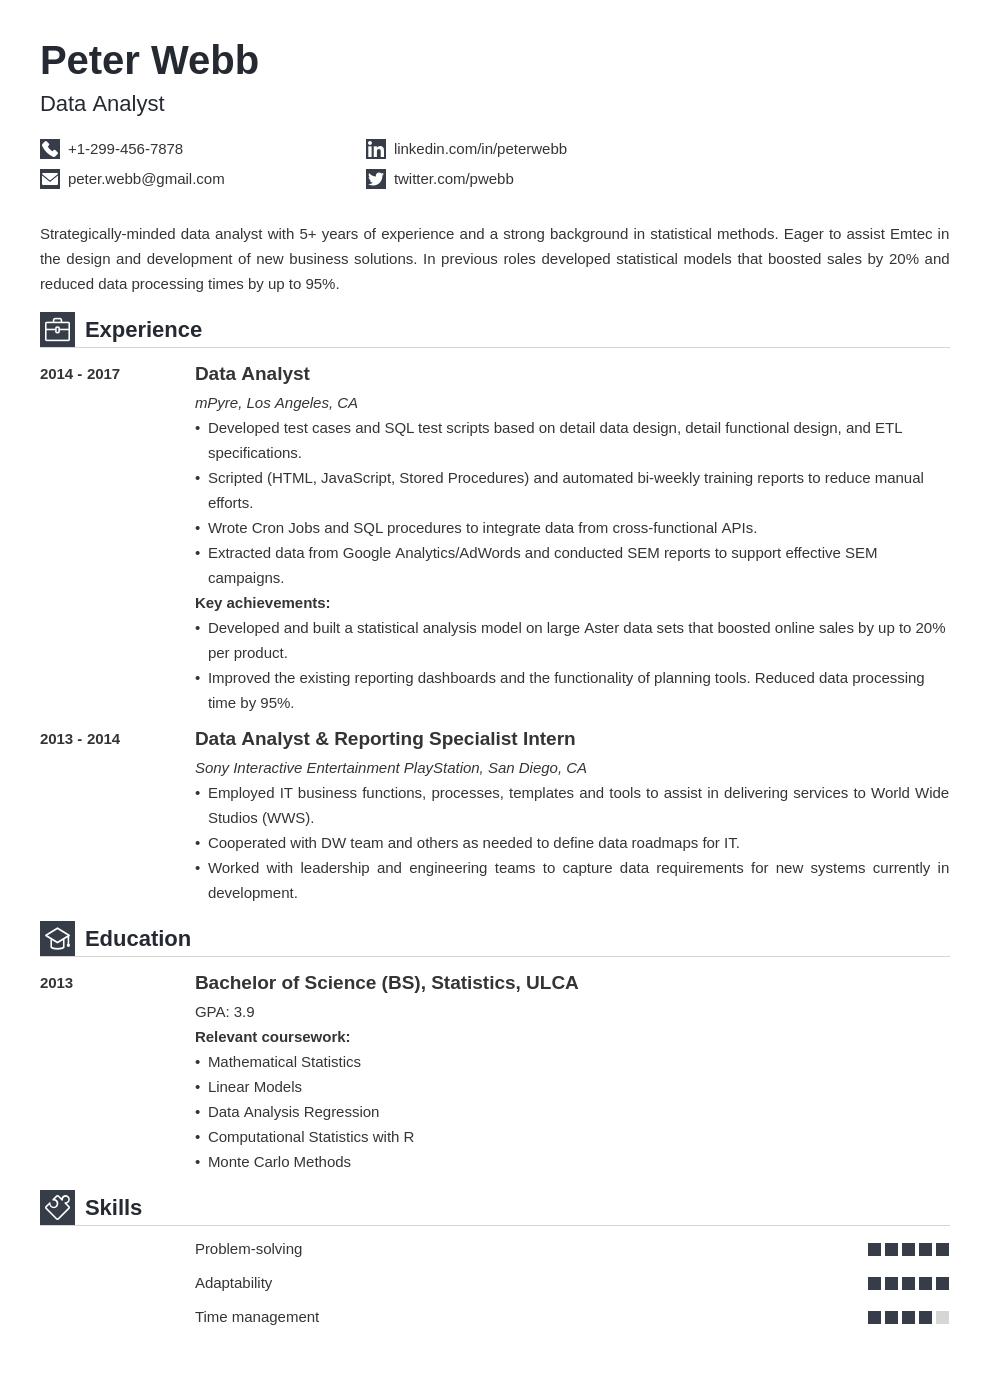 data analyst template iconic uk